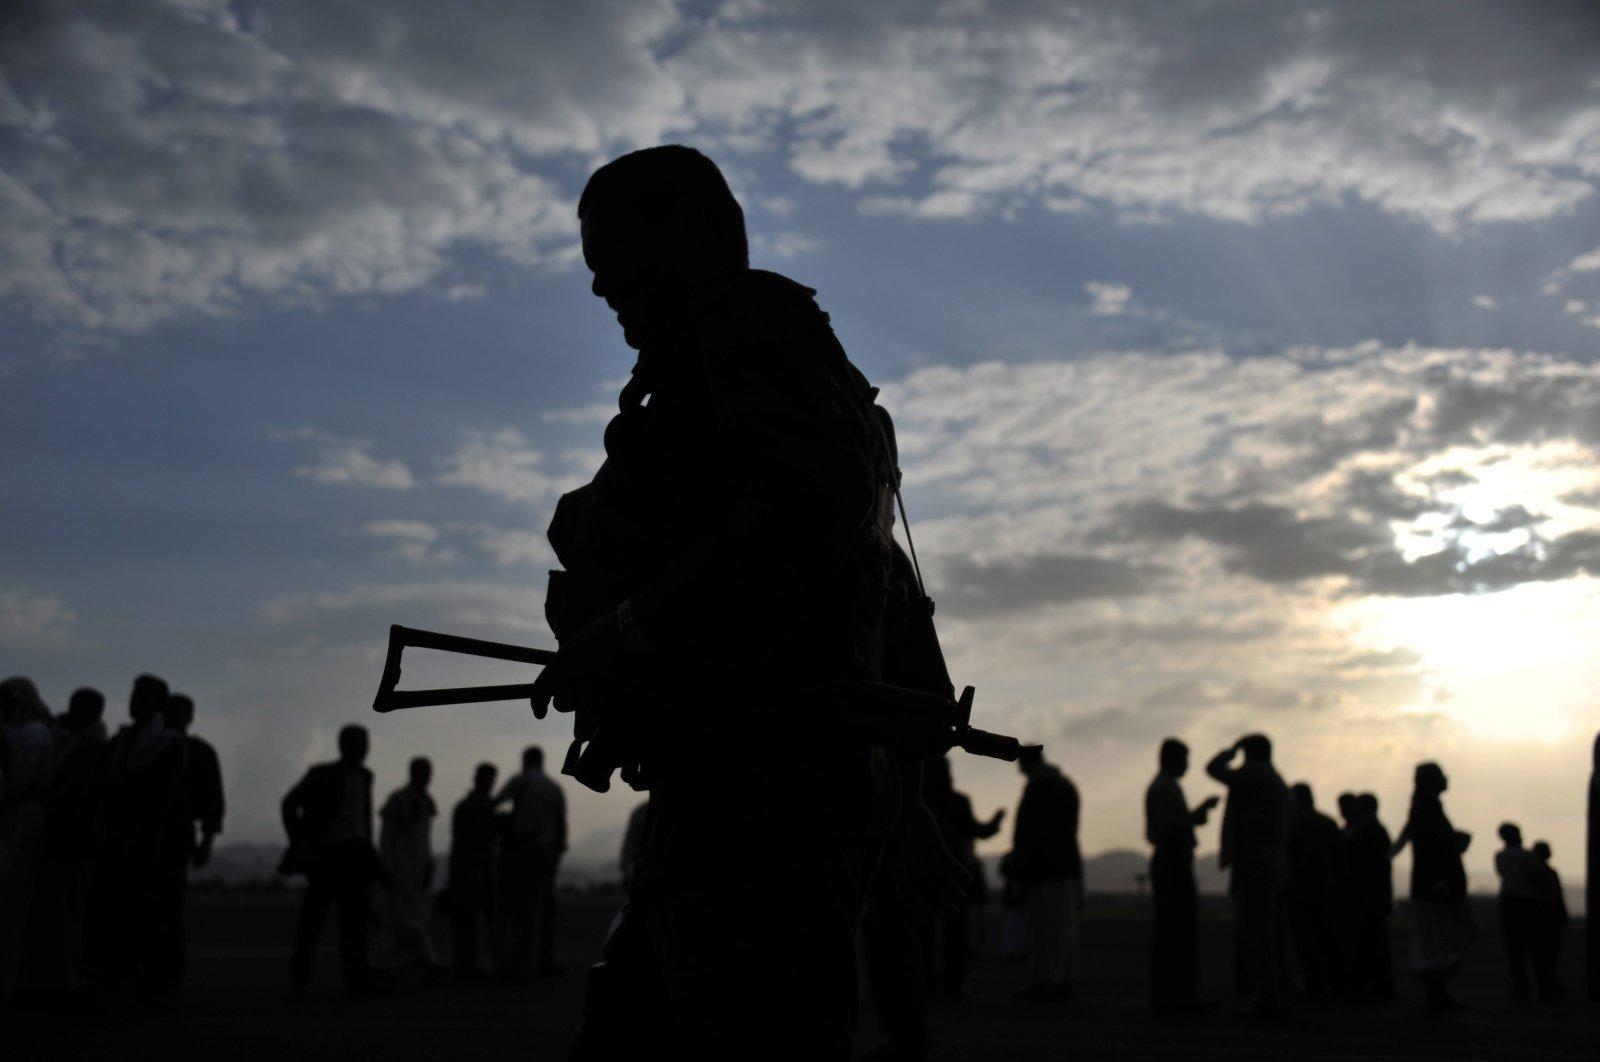 Yemeni soldiers stand guard at the Sanaa Airport in Sanaa, Yemen, Aug. 23, 2011. (EPA Photo)